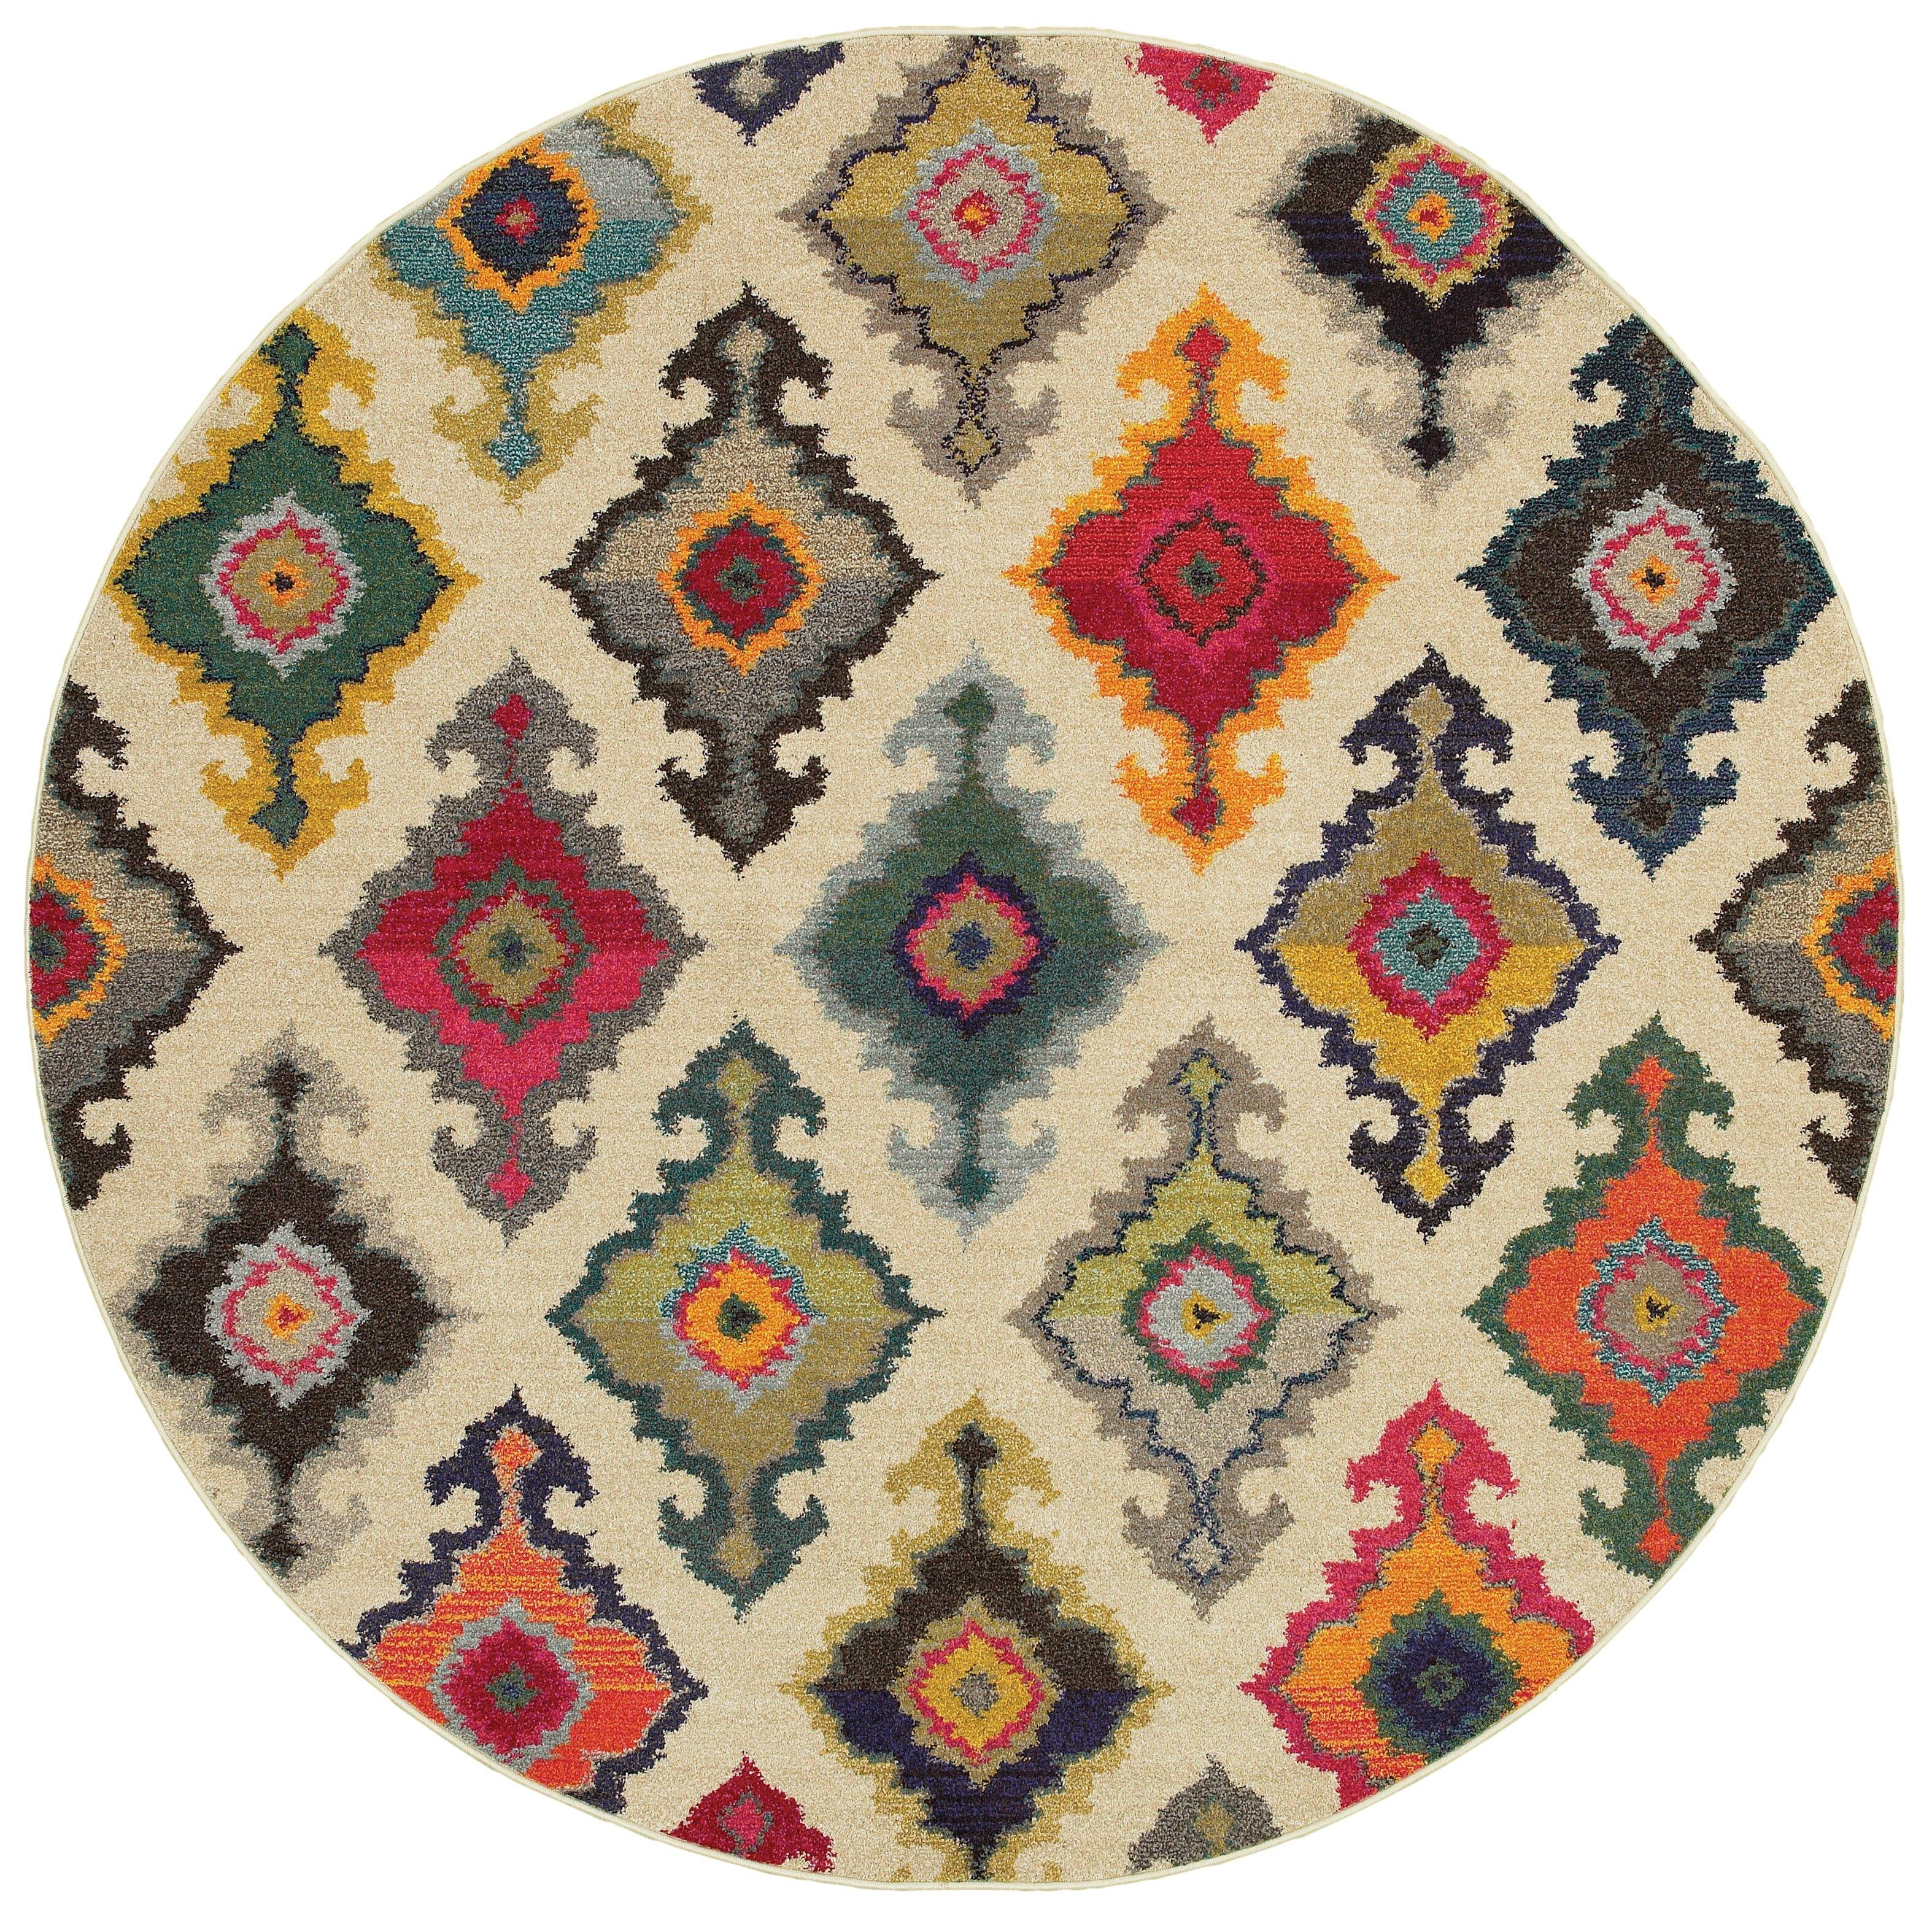 Rug Kaleidoscope Runner: The Conestoga Trading Co. Aura Tribal Ivory/Multi Area Rug